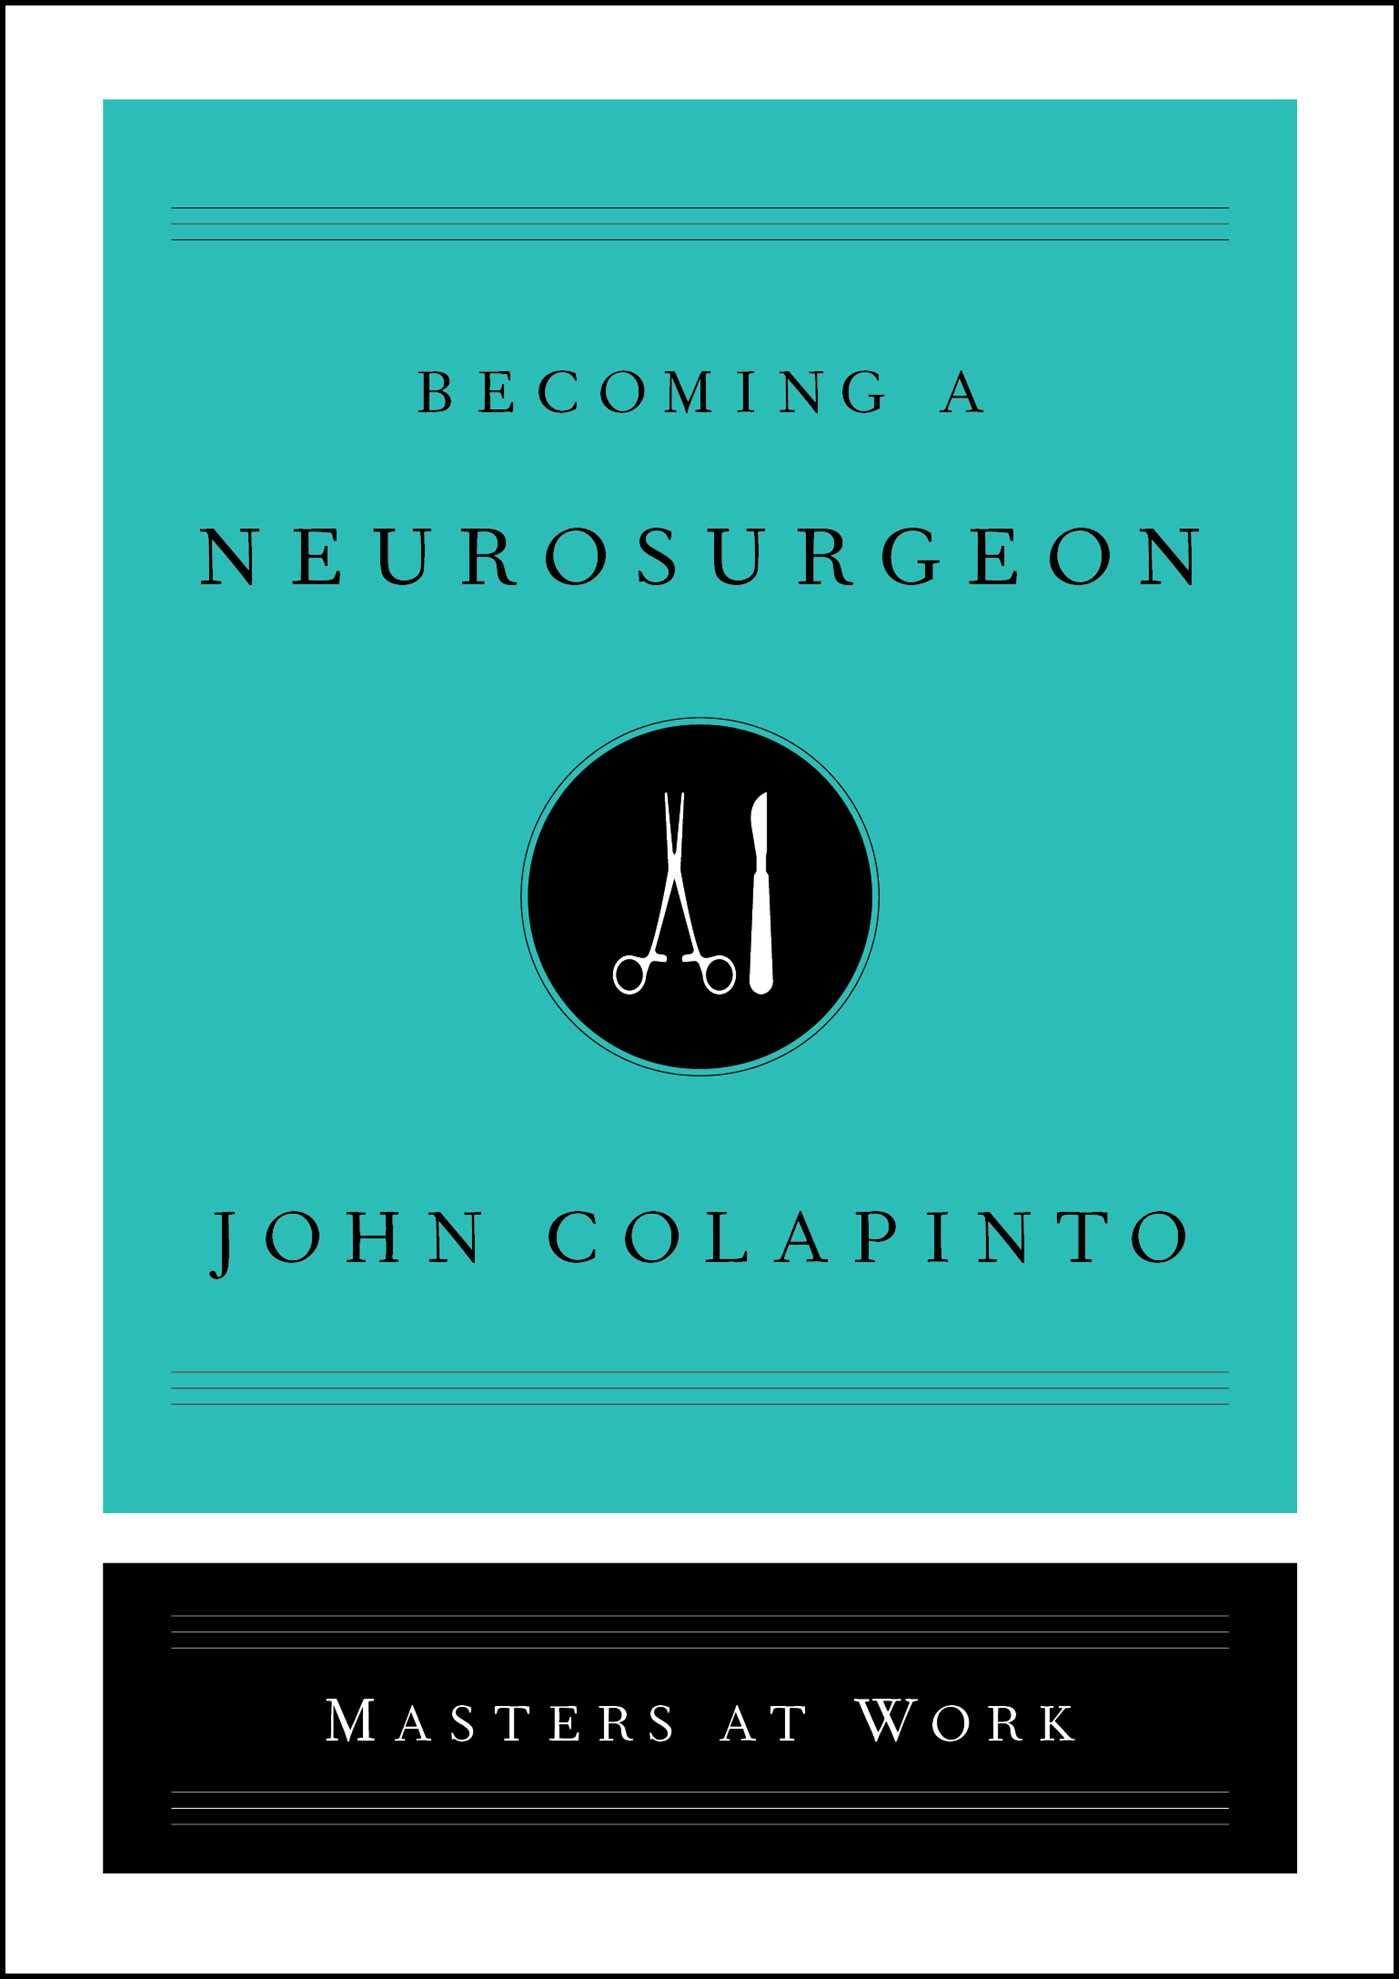 Amazon fr - Becoming a Neurosurgeon - John Colapinto - Livres